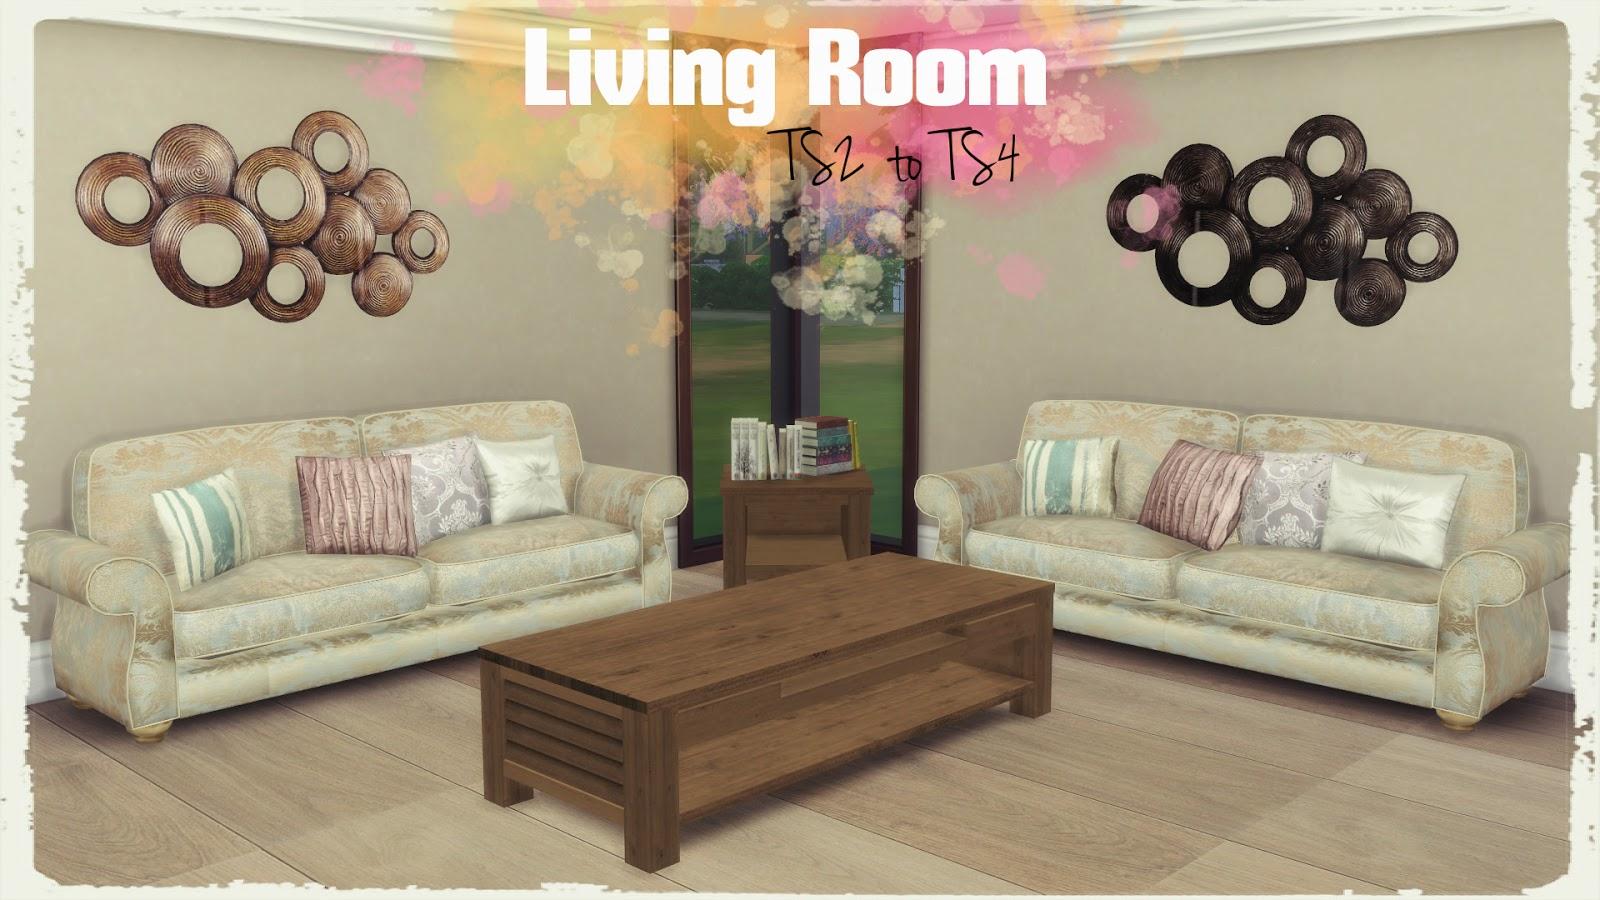 months sims 2 living room set Hiring advice Trade